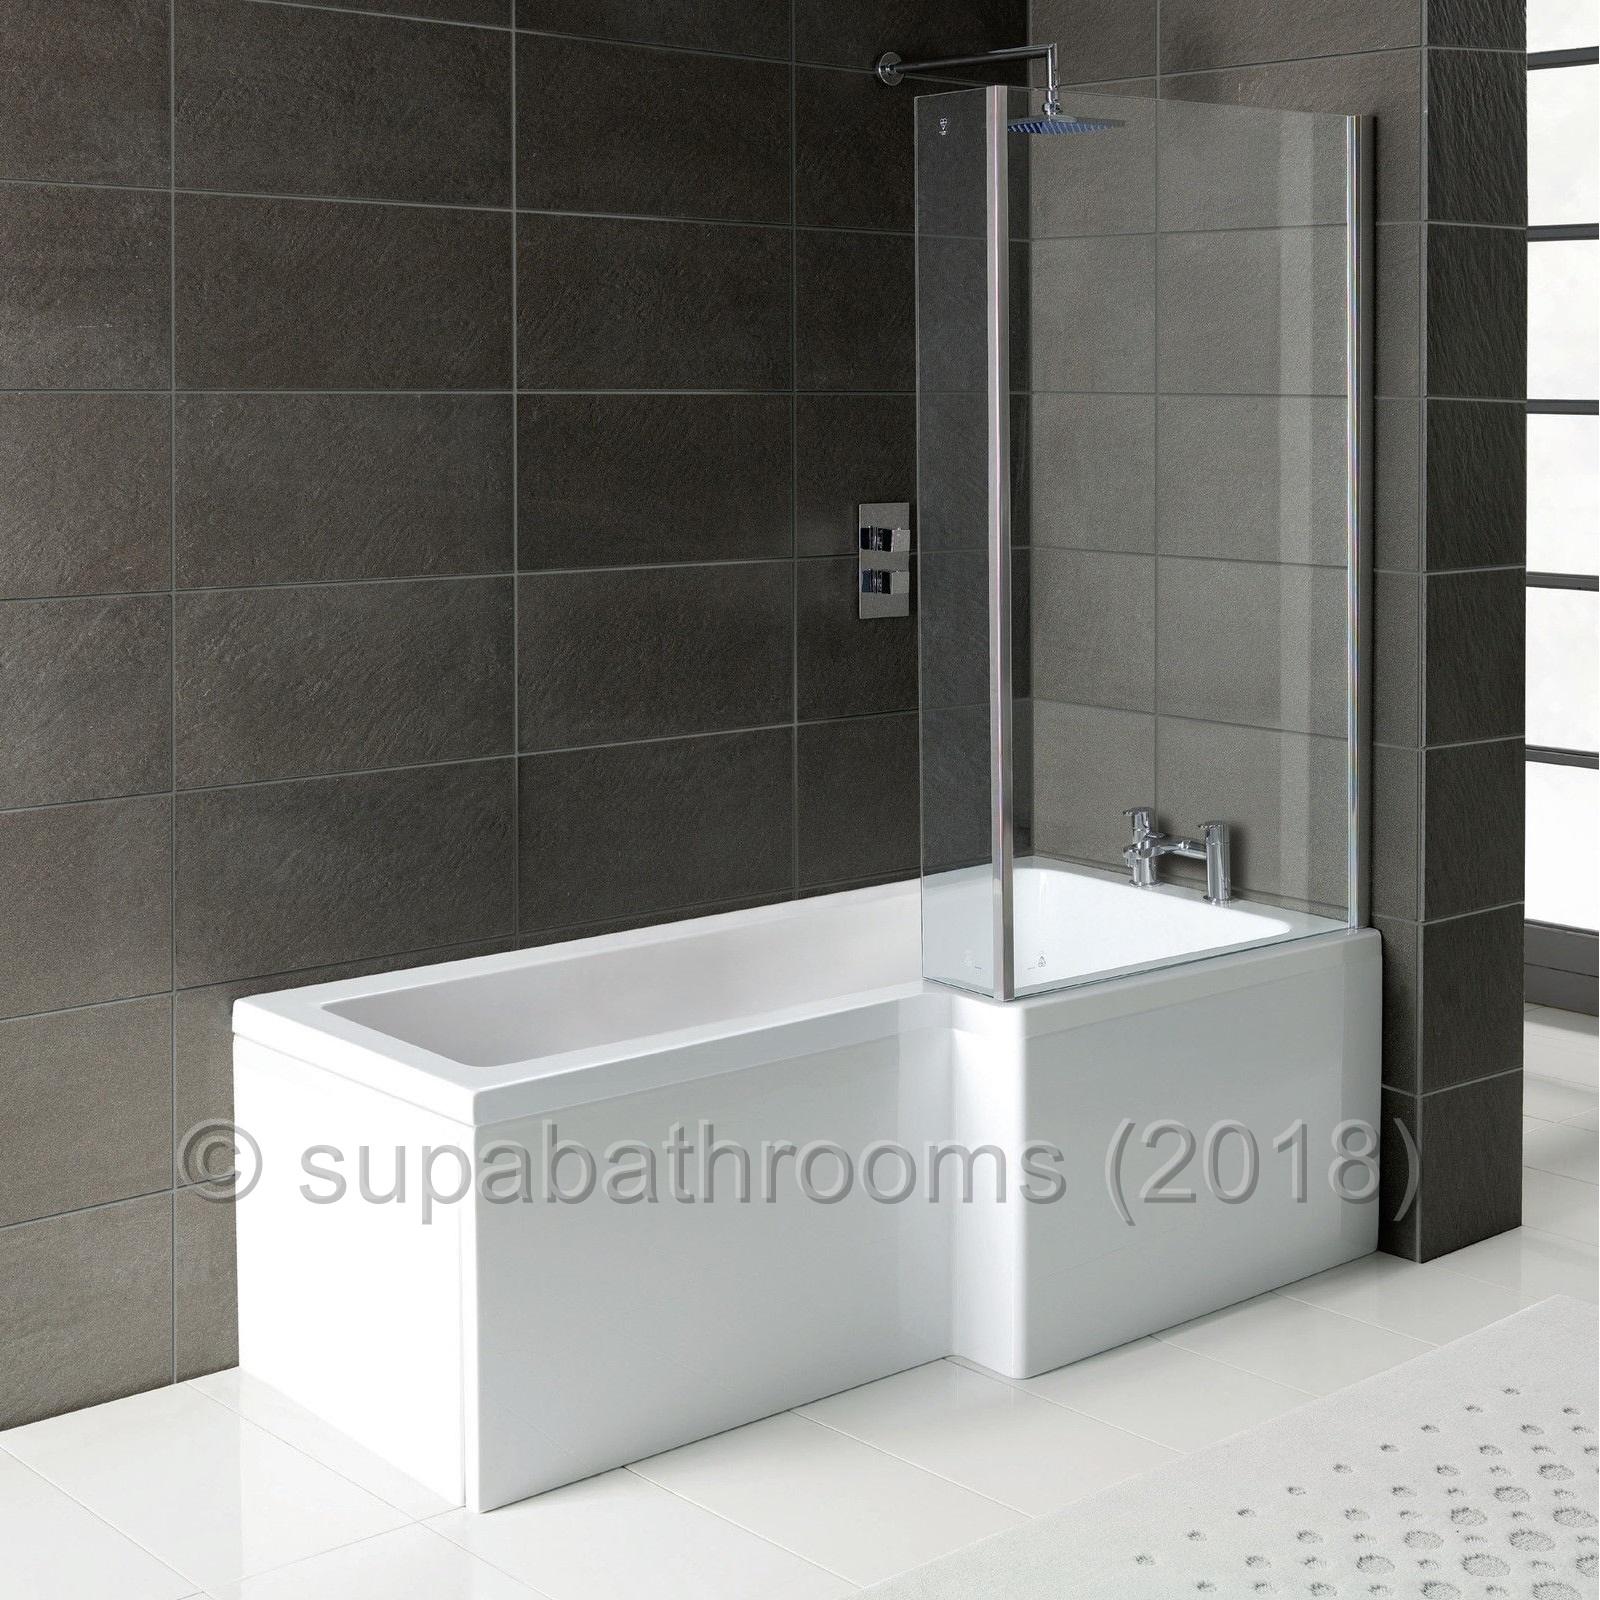 L Shape Square 1700 Shower Bath Panels, Glass Screen & Bath Waste | eBay